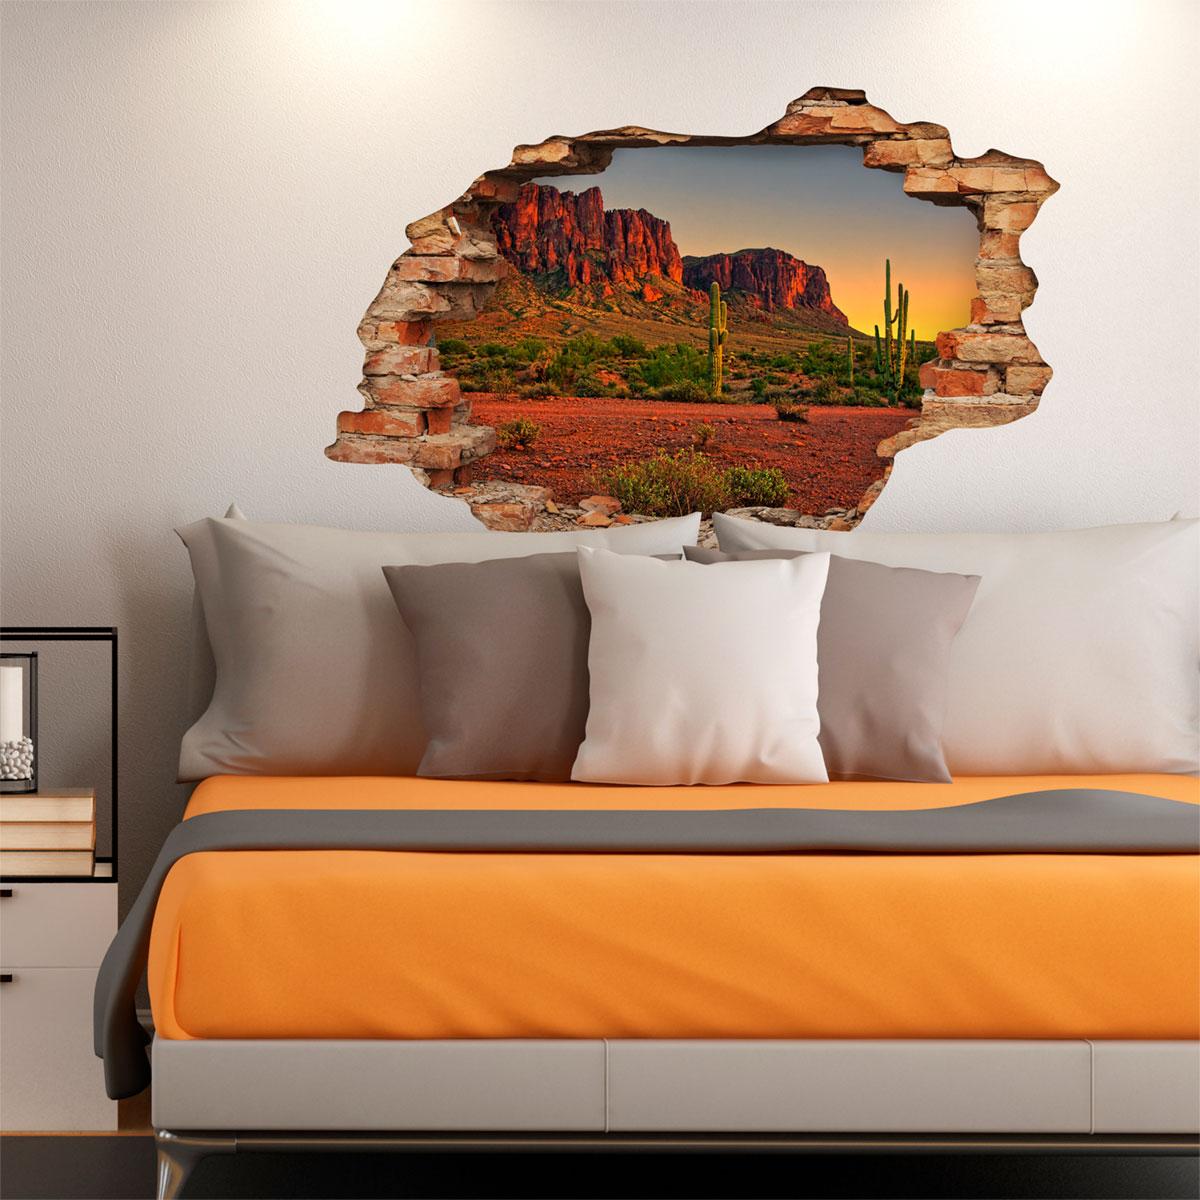 sticker trompe l 39 oeil d sert du nevada stickers nature arbres ambiance sticker. Black Bedroom Furniture Sets. Home Design Ideas